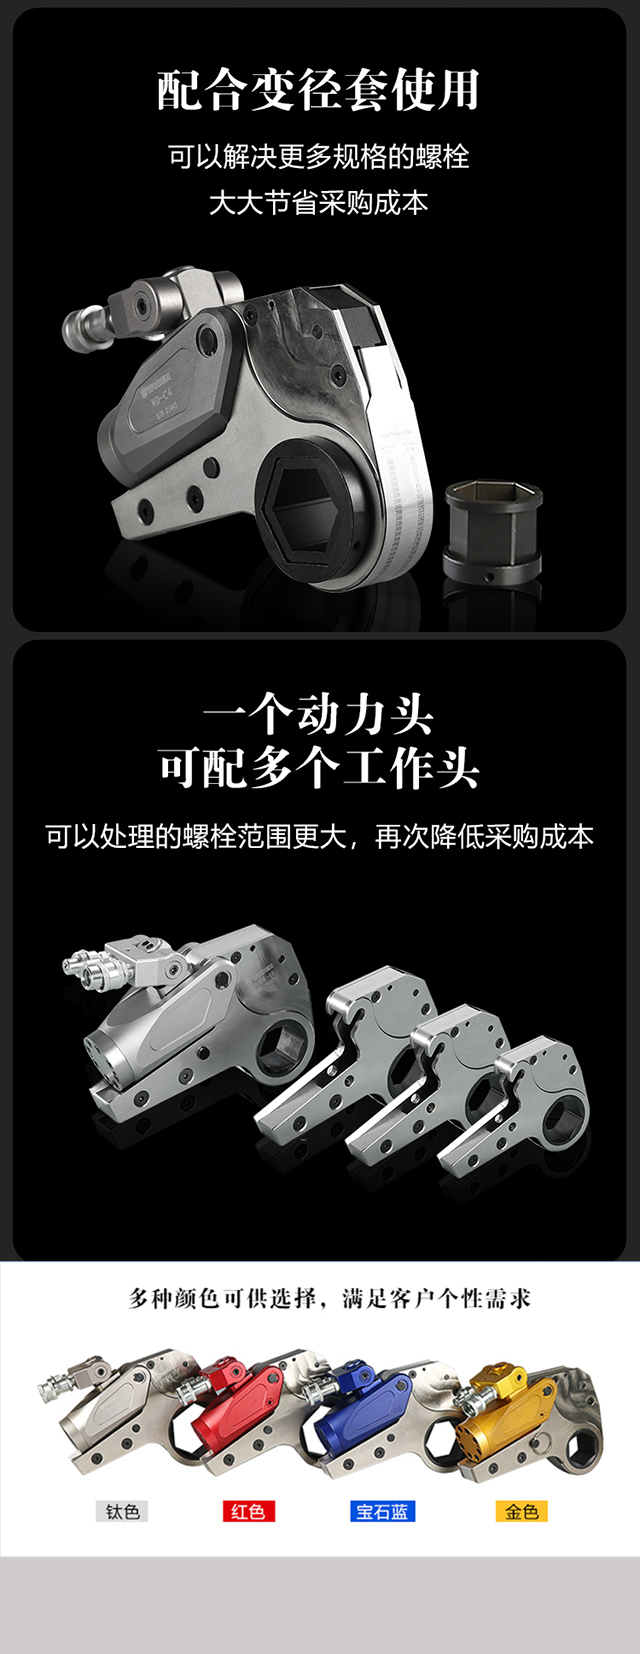 WD-C中空LOL雷电竞雷电竞备用网站详情介绍